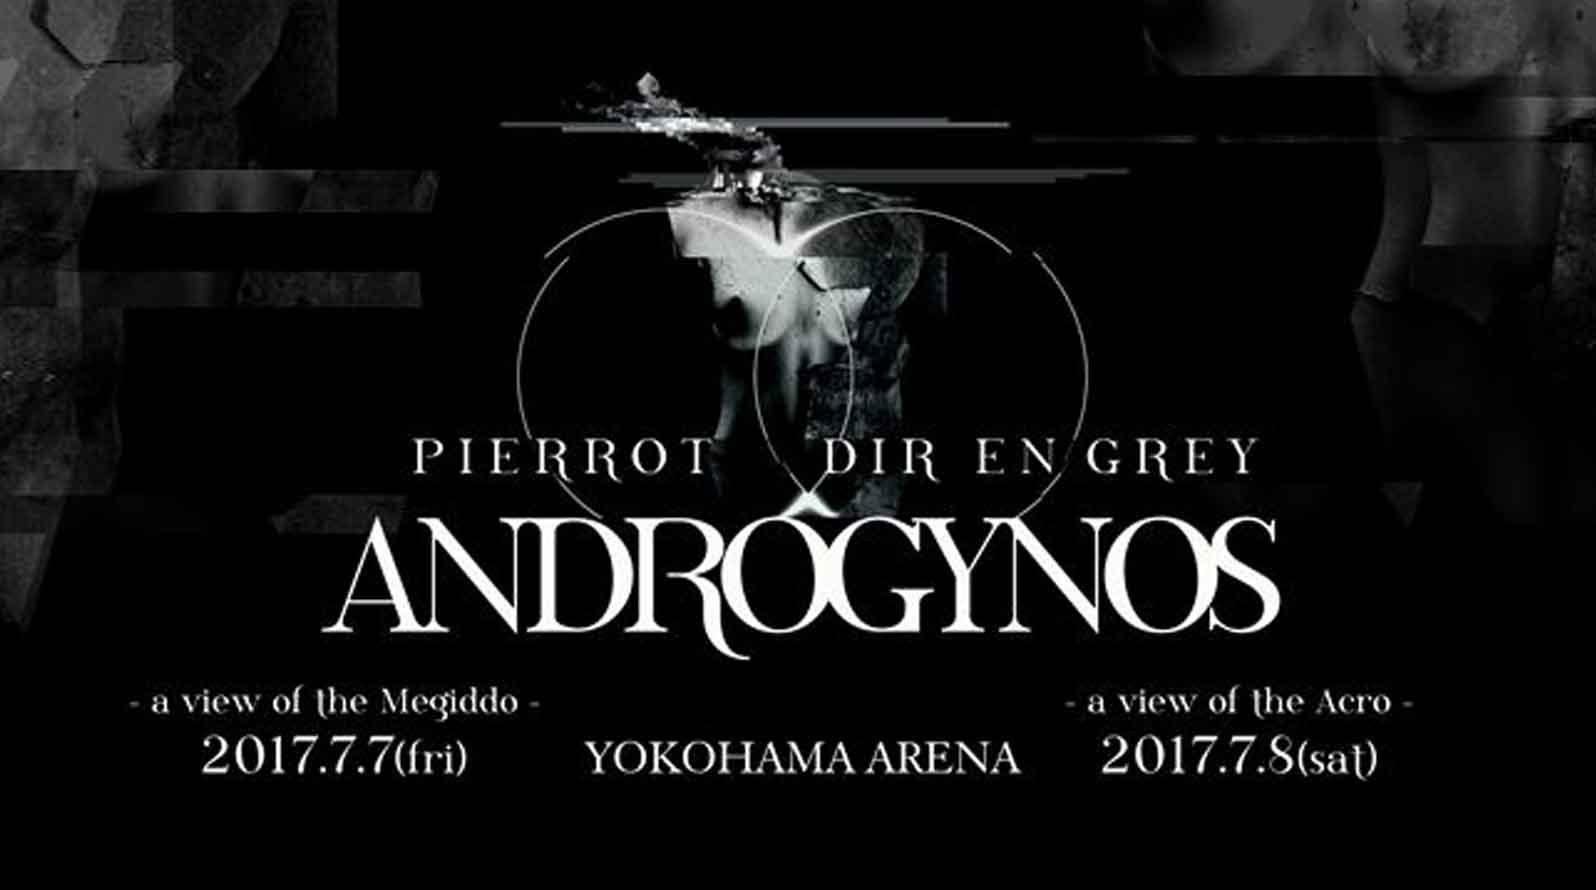 PIERROT與DIR EN GREY共同舉辦之演出計畫「ANDROGYNOS」公布會場規劃